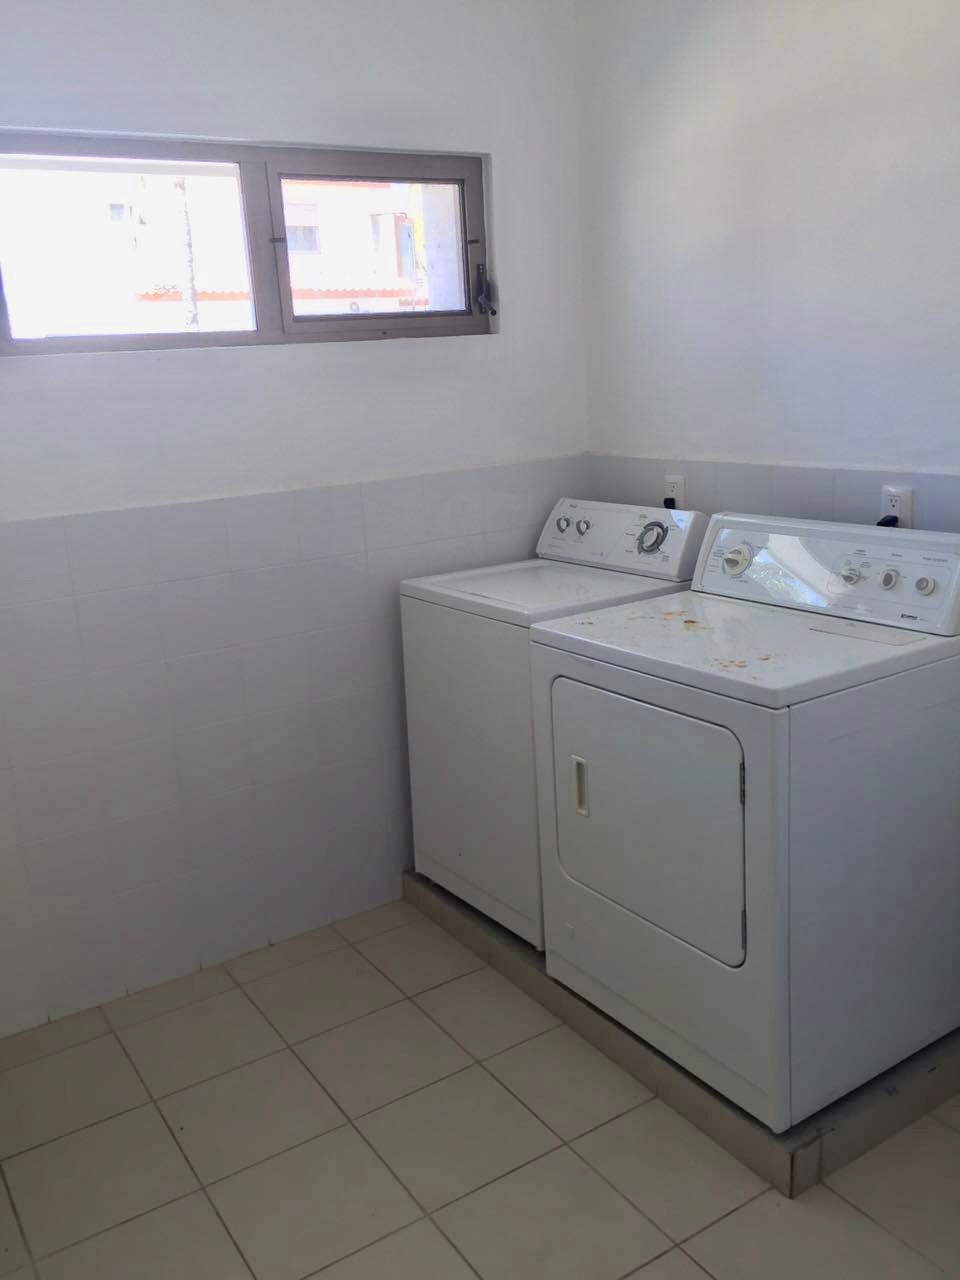 Laundry area.